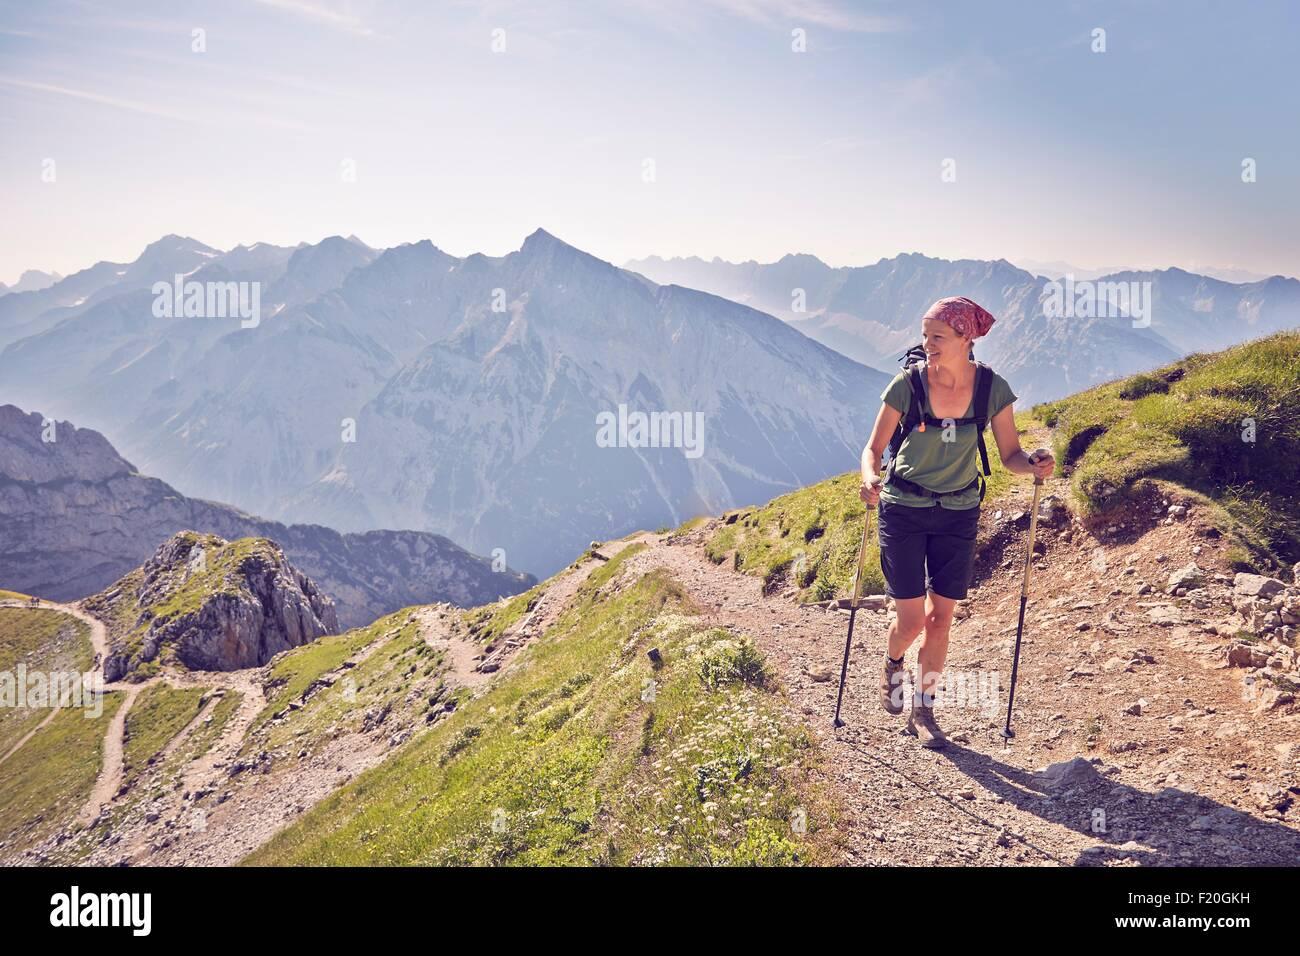 Mature woman hiking along mountain path, Karwendel-Mittenwald, Bavaria, Germany - Stock Image